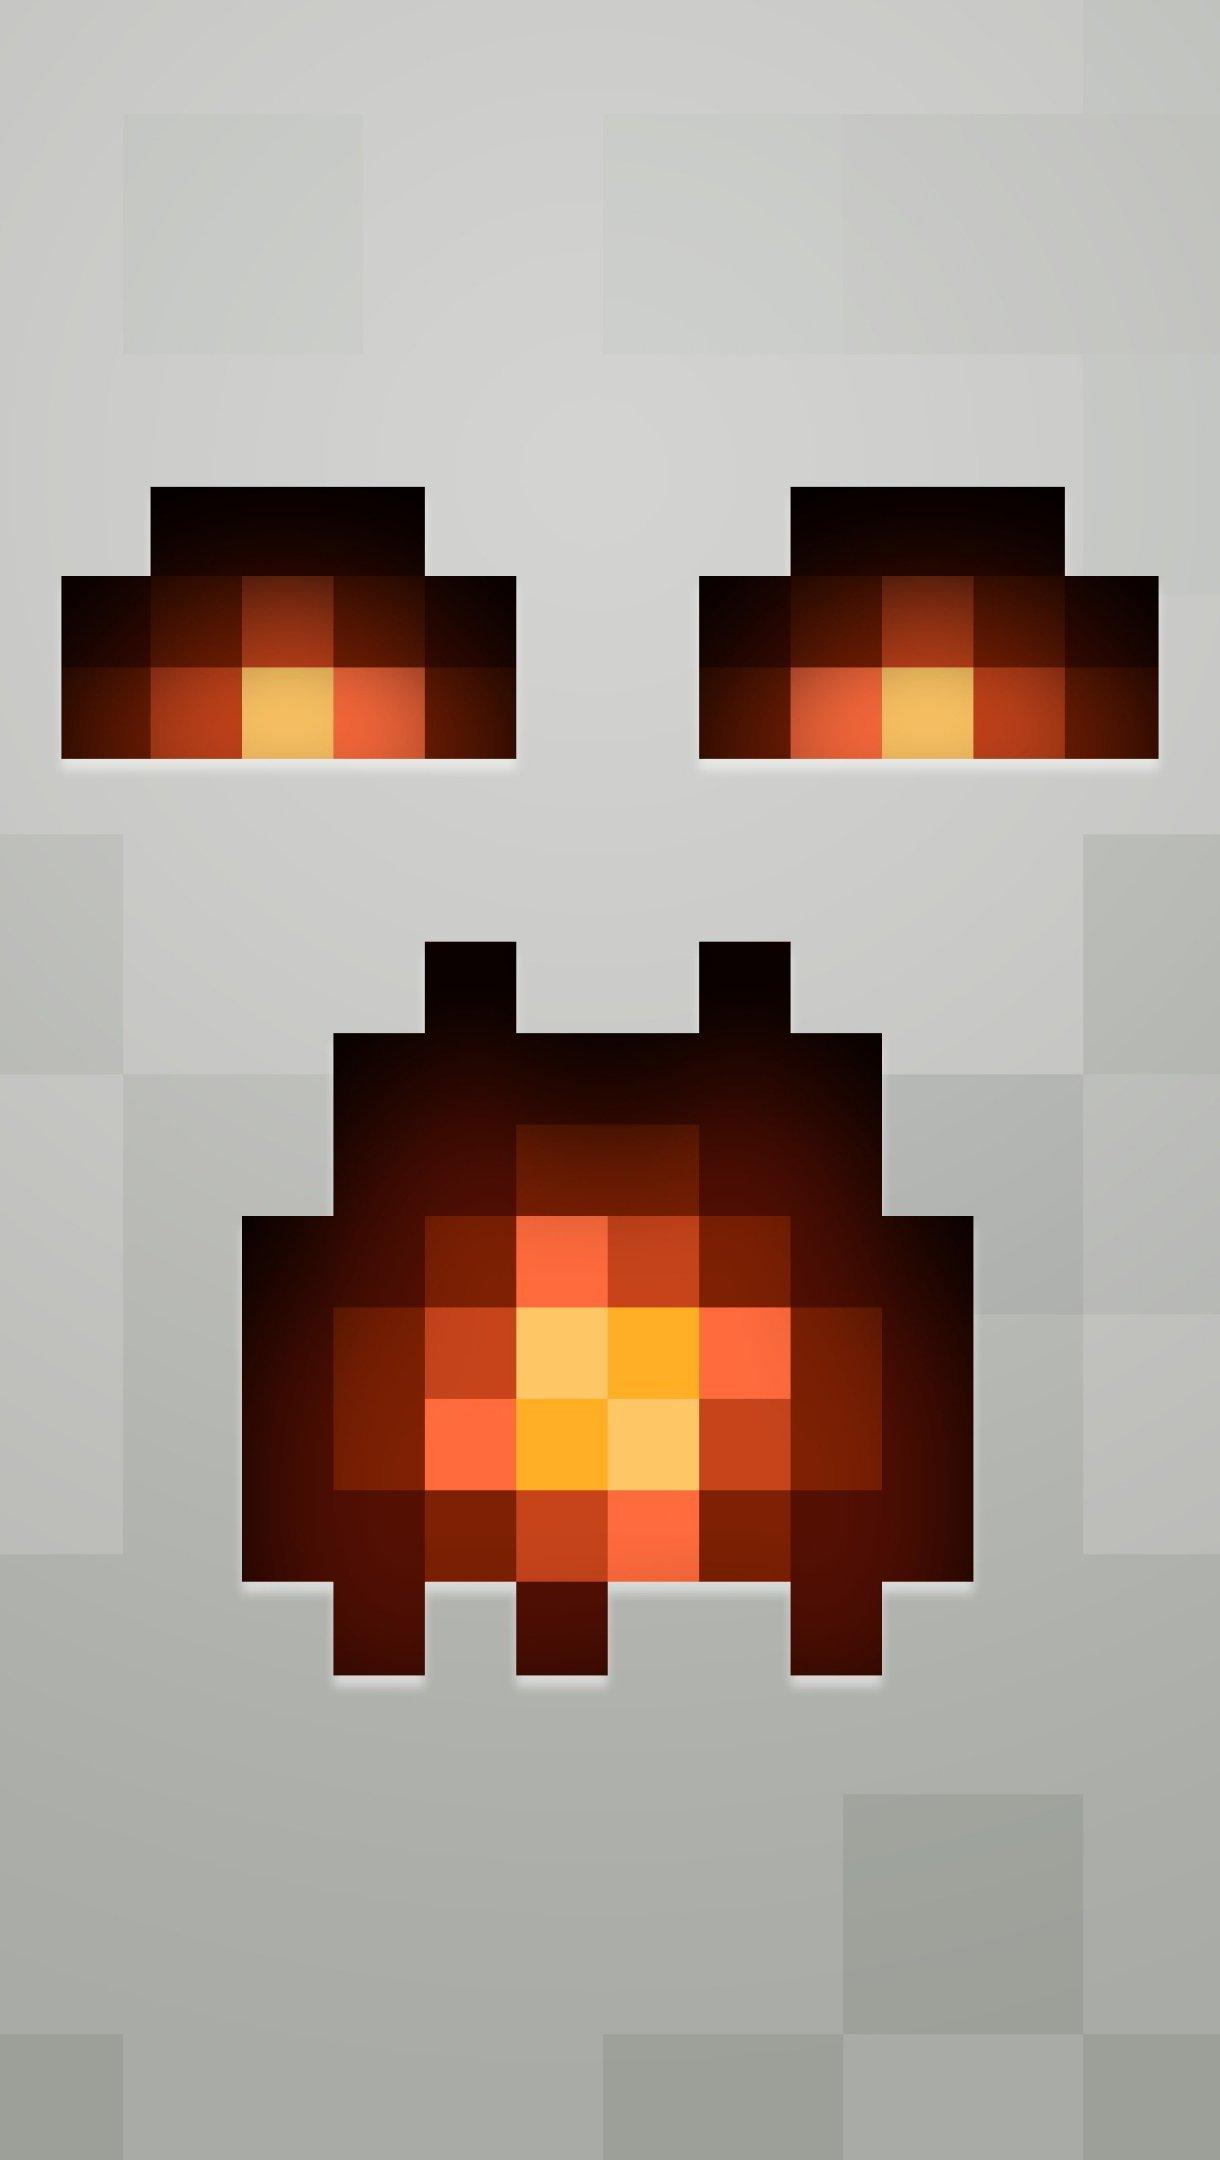 Fondos de pantalla Minecraft Vertical